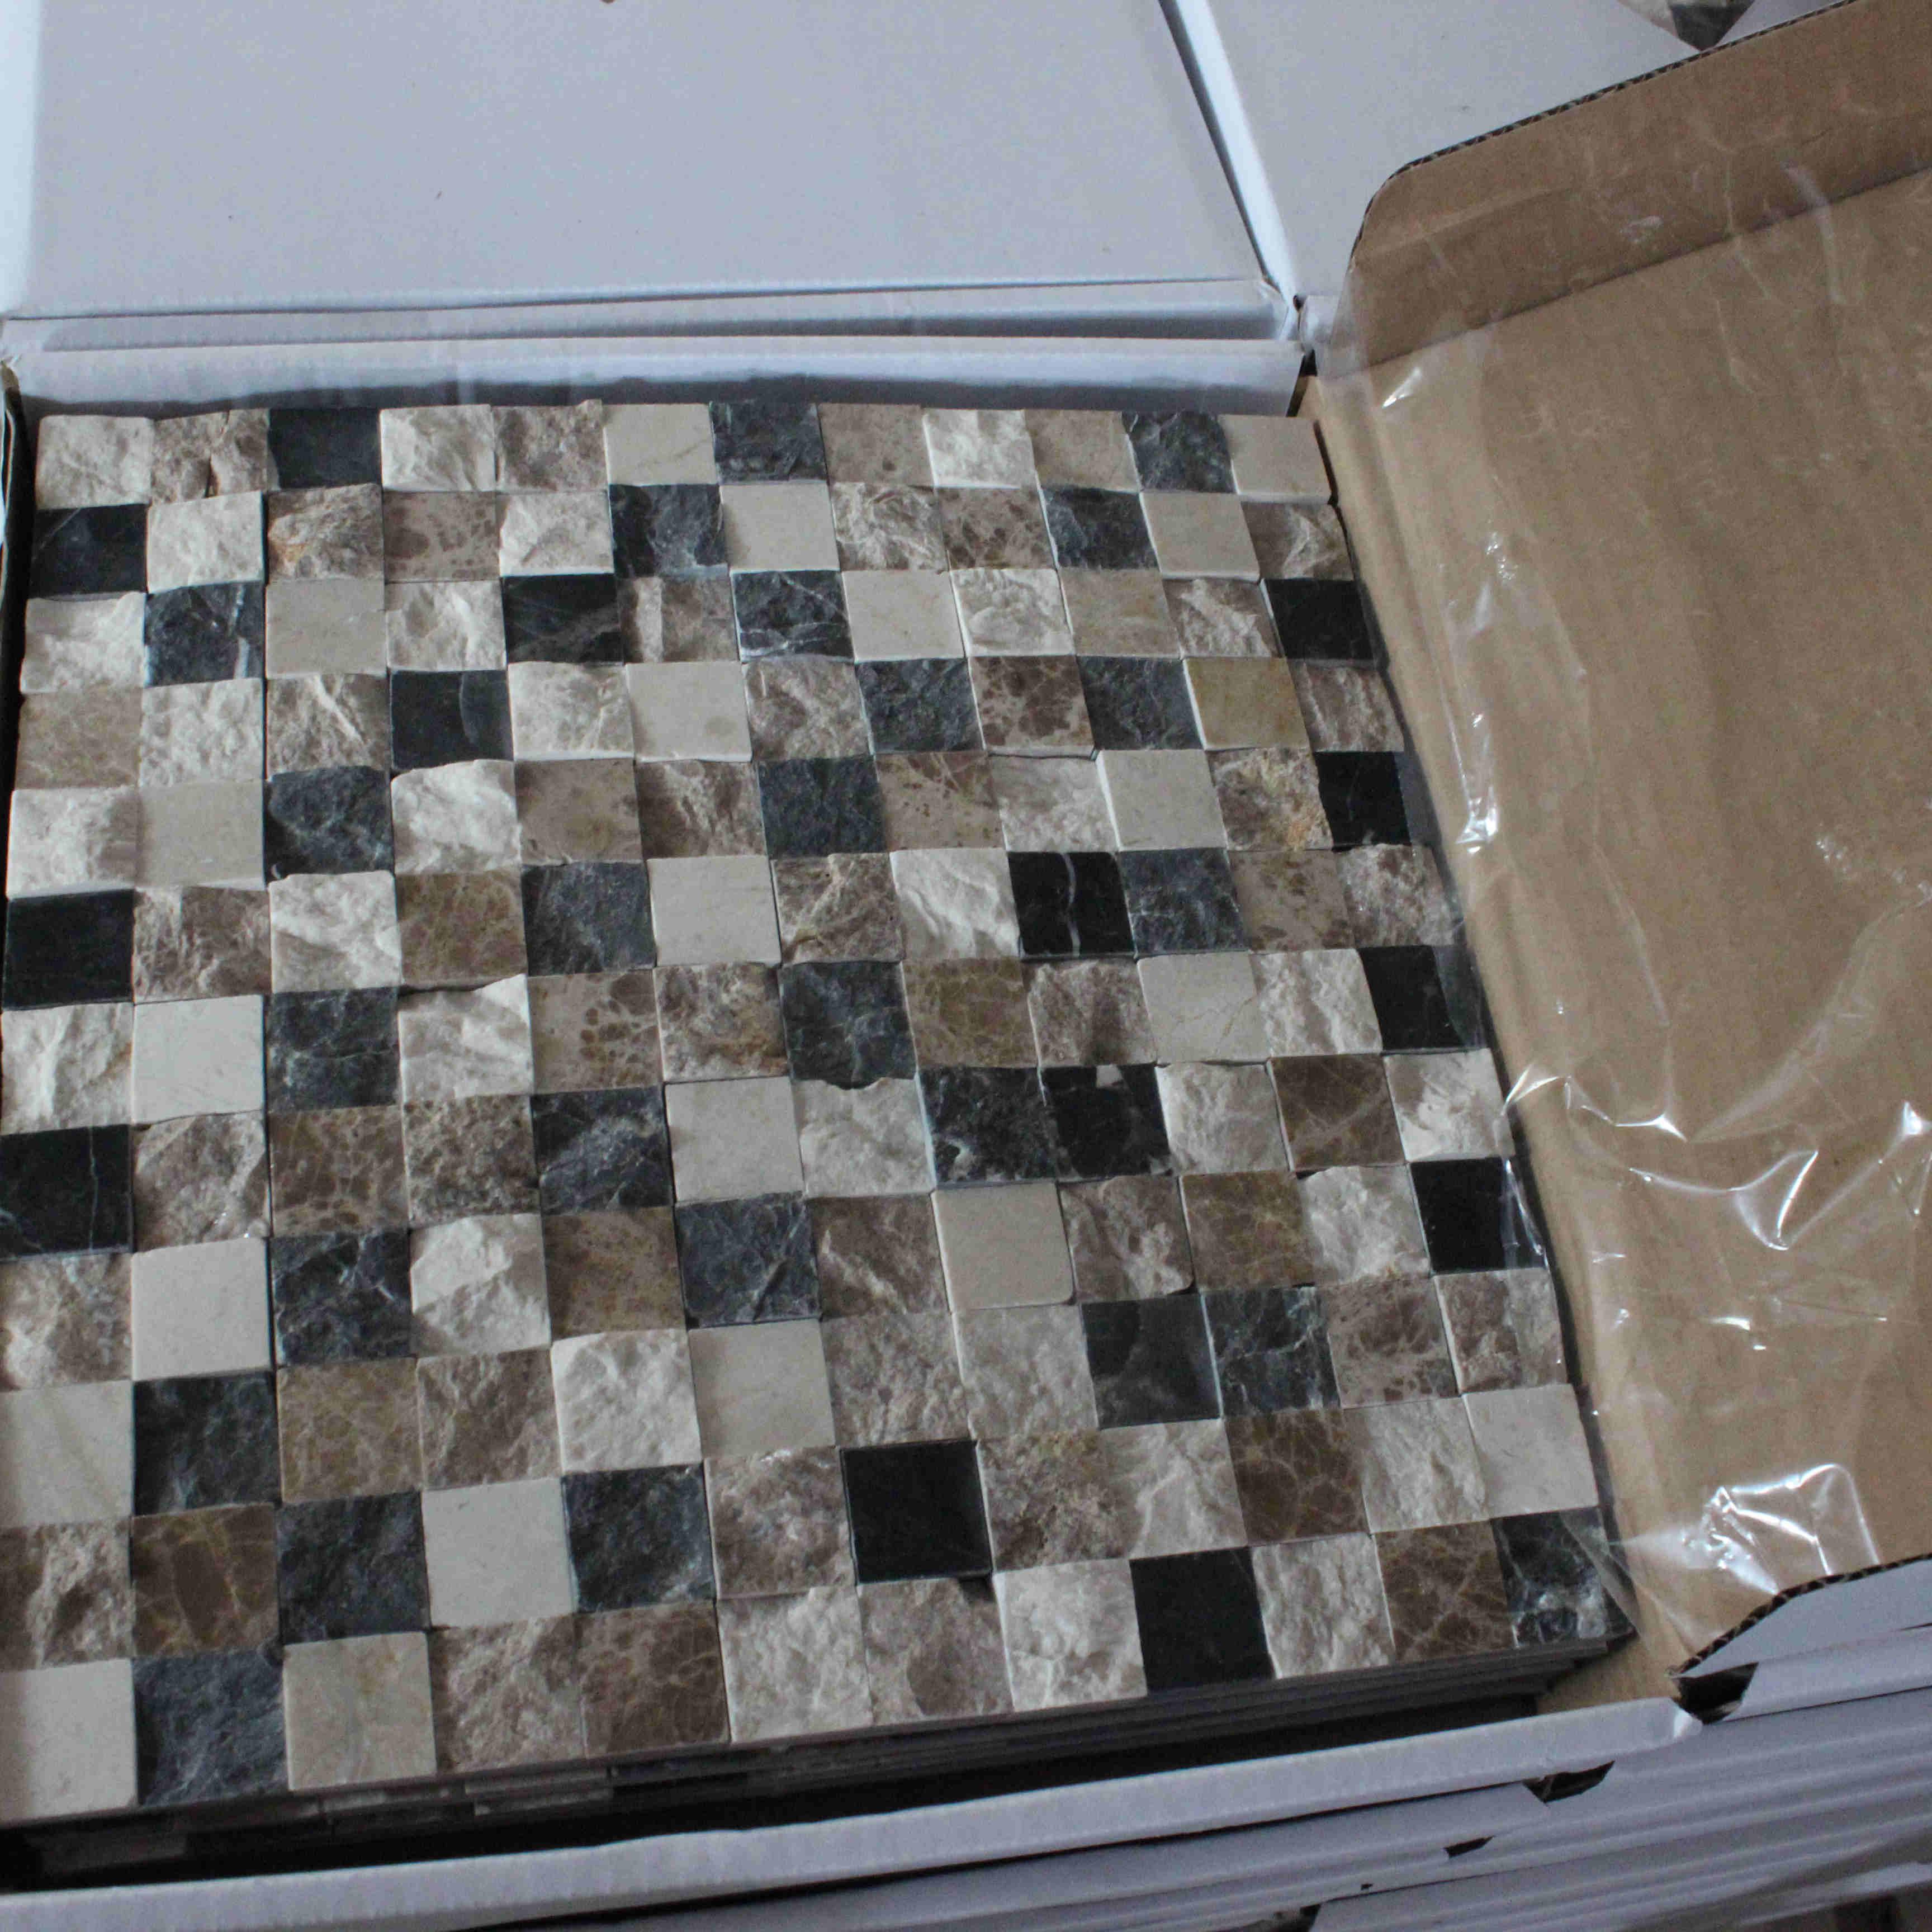 natural stone mosaic tiles floor tiles standard size mosaic buy standard mosaic tile floor floor mosaic stone mosaic product on alibaba com